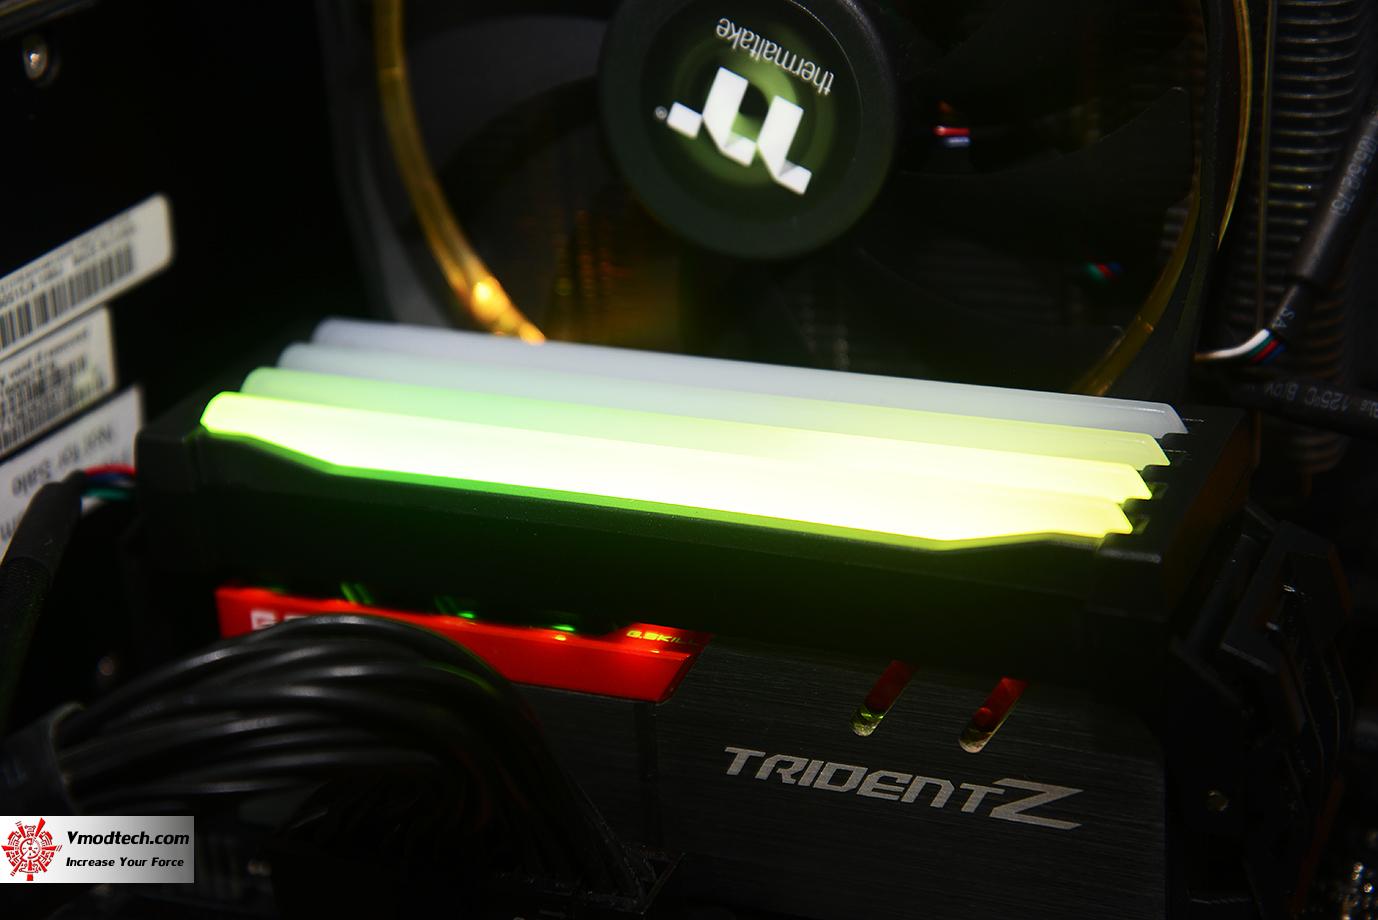 dsc 5595 Thermaltake Pacific R1 Plus DDR4 Memory Lighting Kit Review